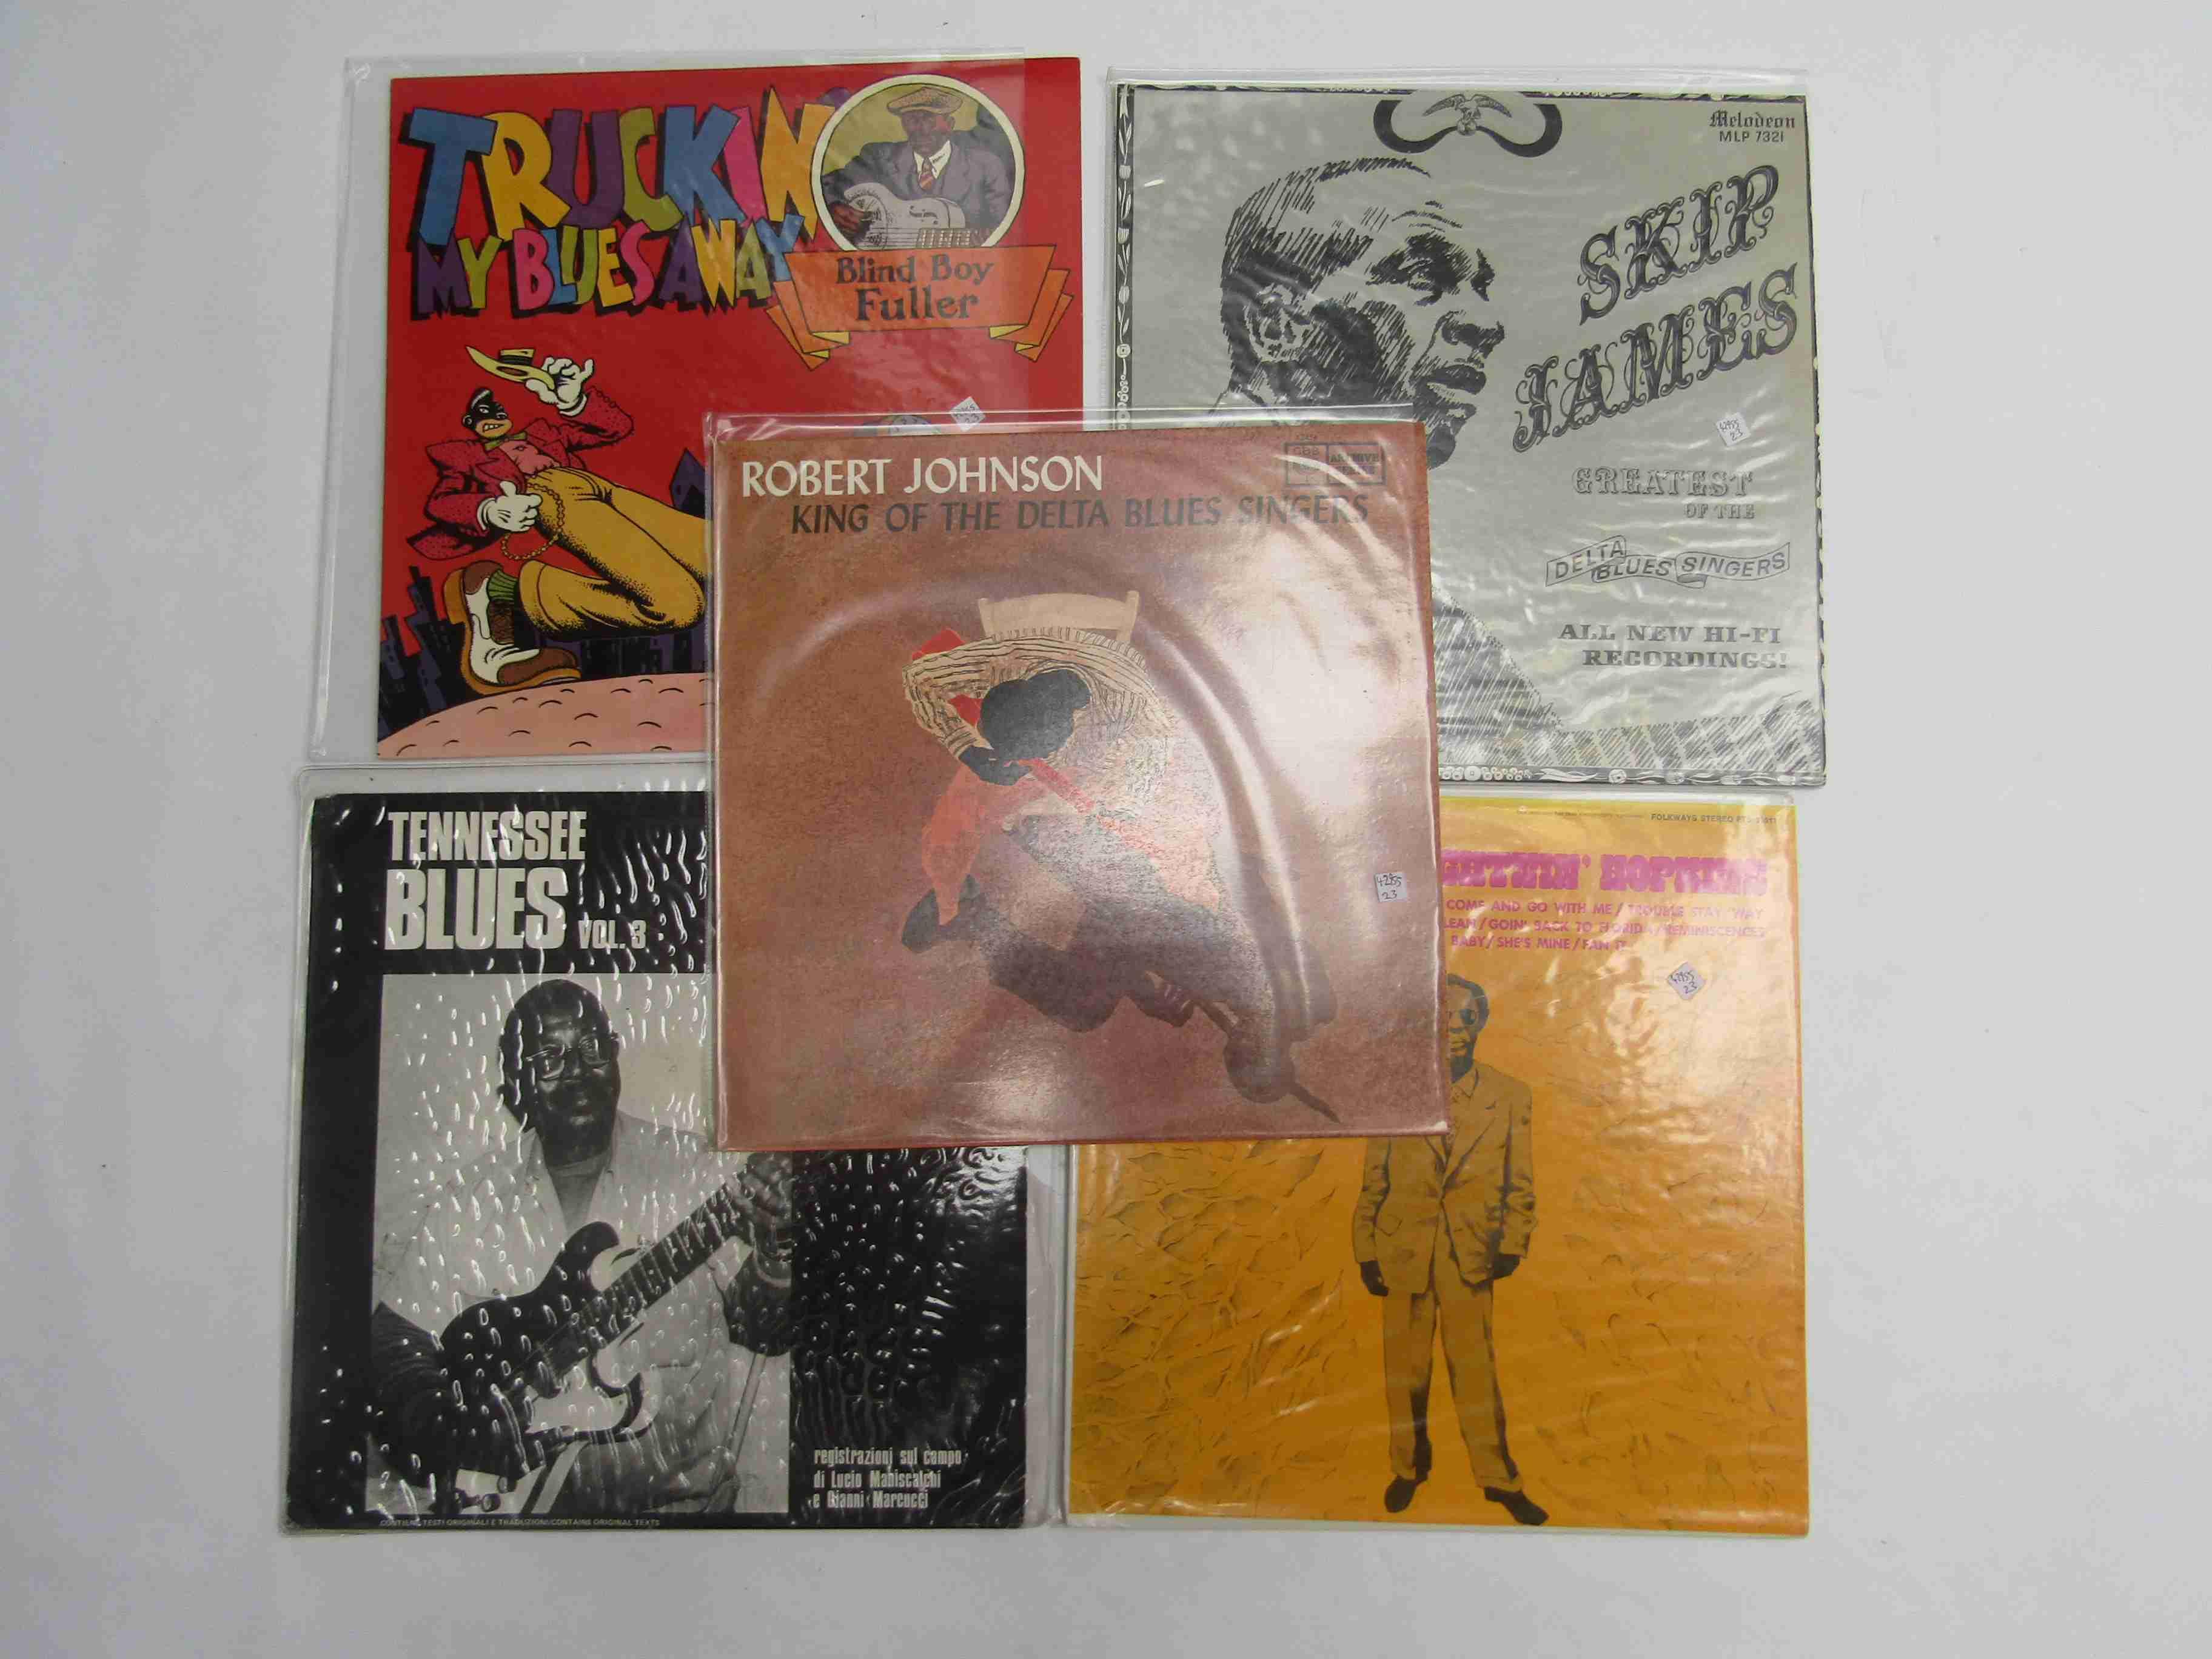 Five assorted Blues LPs to include Lightnin' Hopkins 'The Roots Of Lightnin' Hopkins' (Folkways